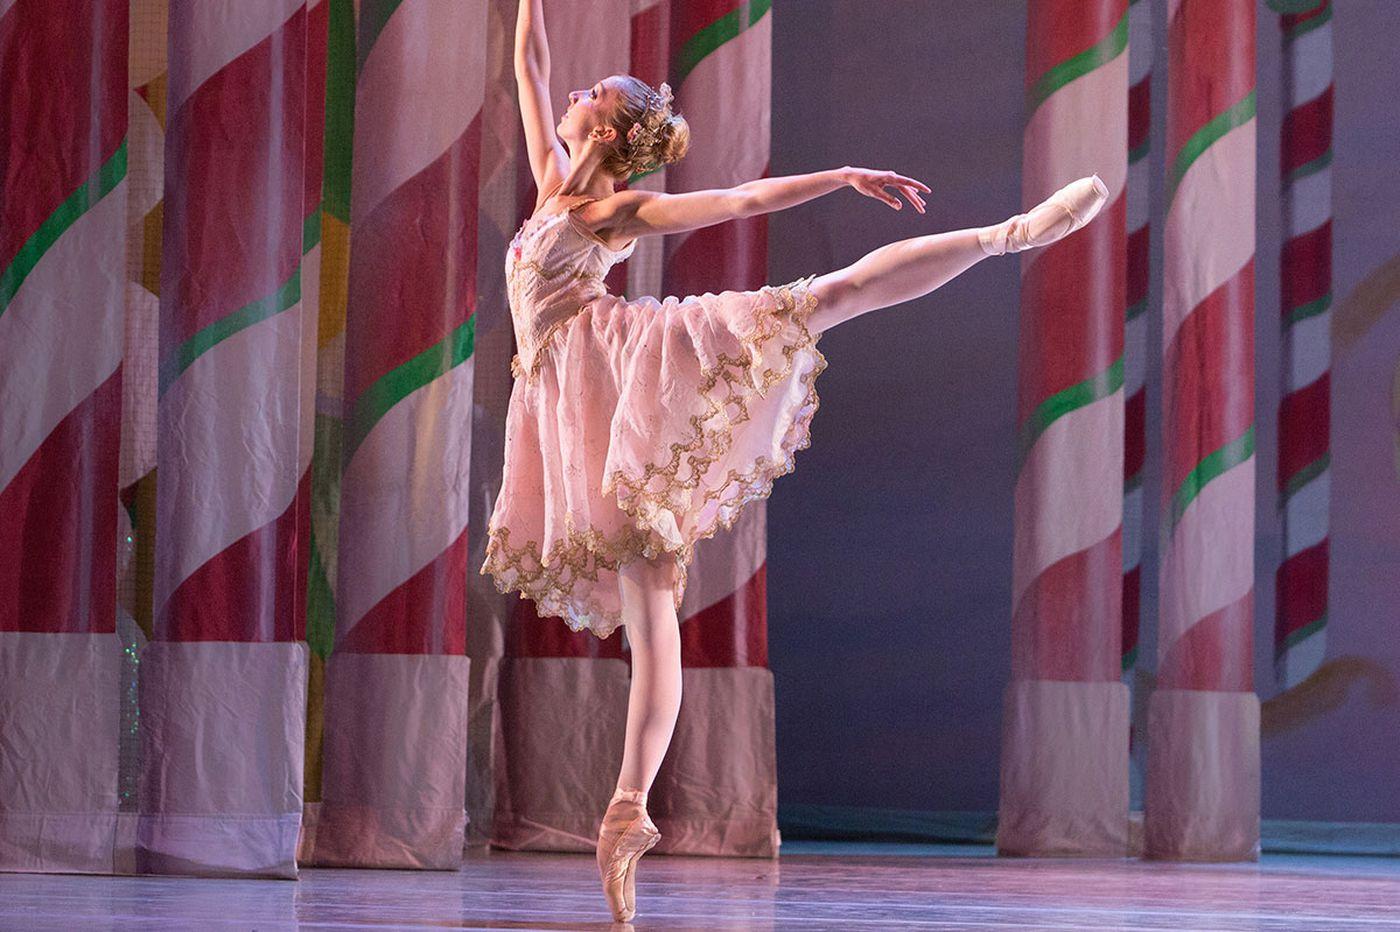 Pennsylvania Ballet fires the Sugar Plum Fairy